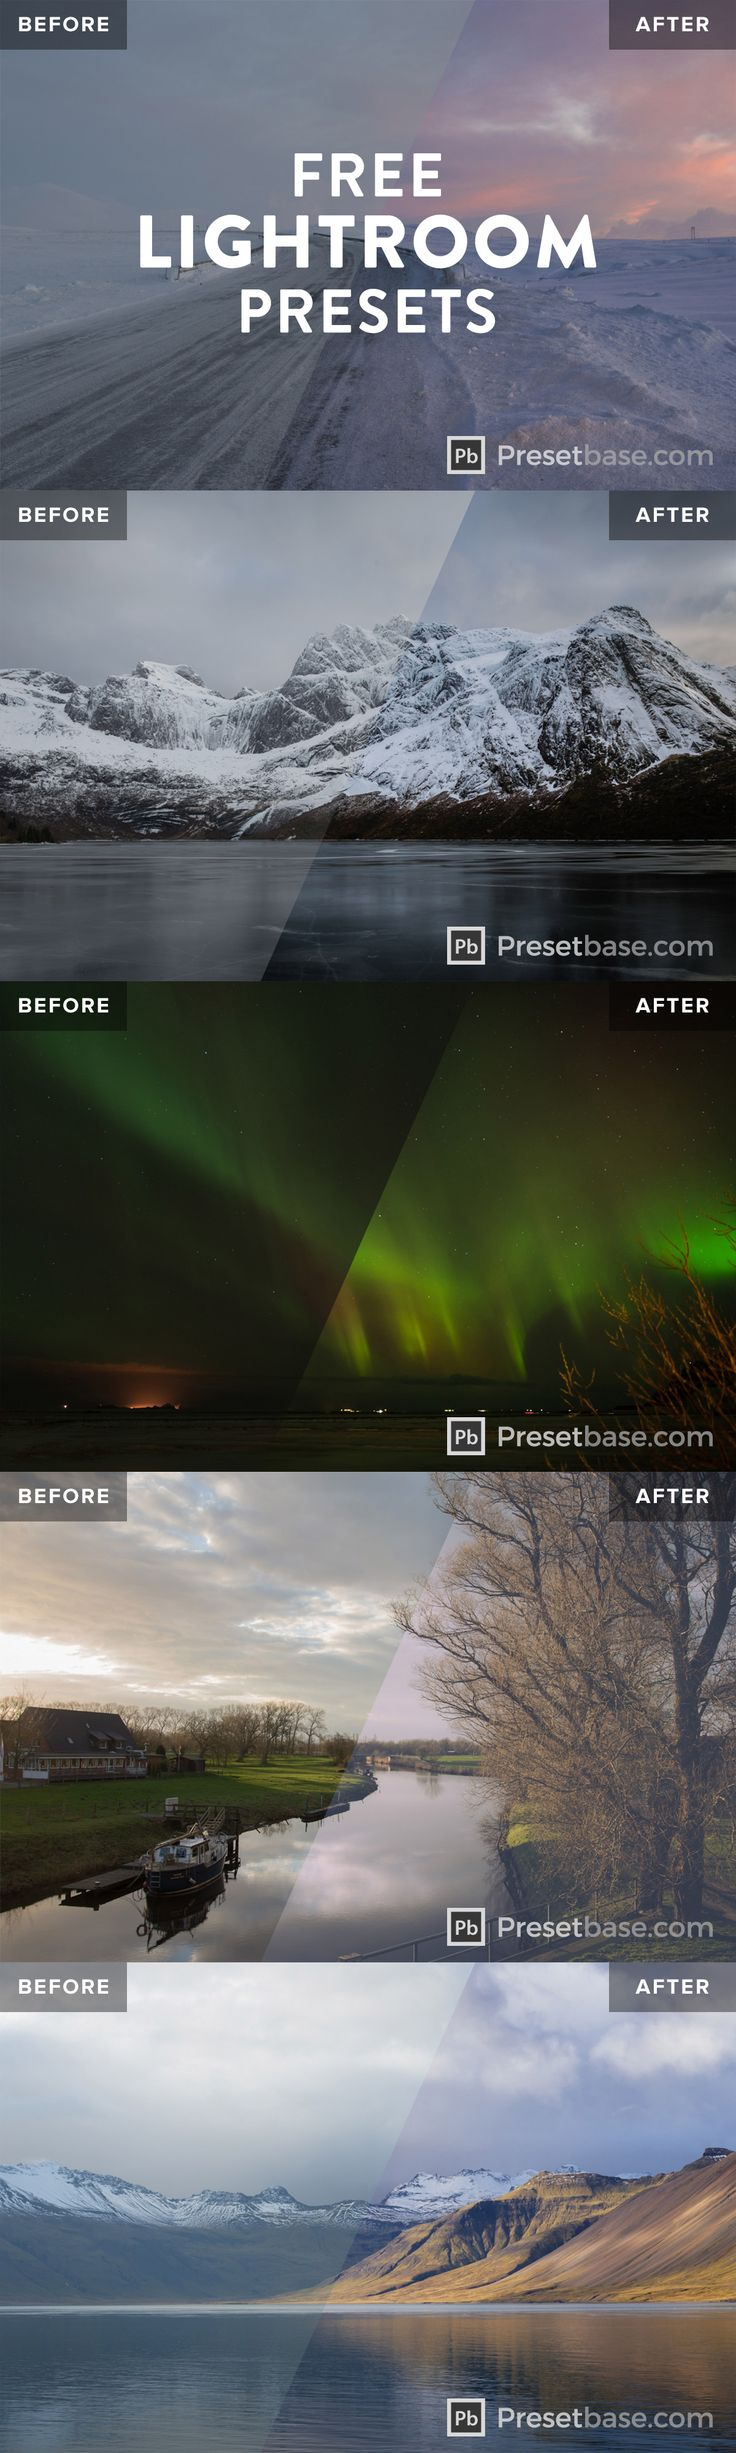 Free Lightroom Preset by @presetbase / Professional Lightroom presets specially developed for landscape photography